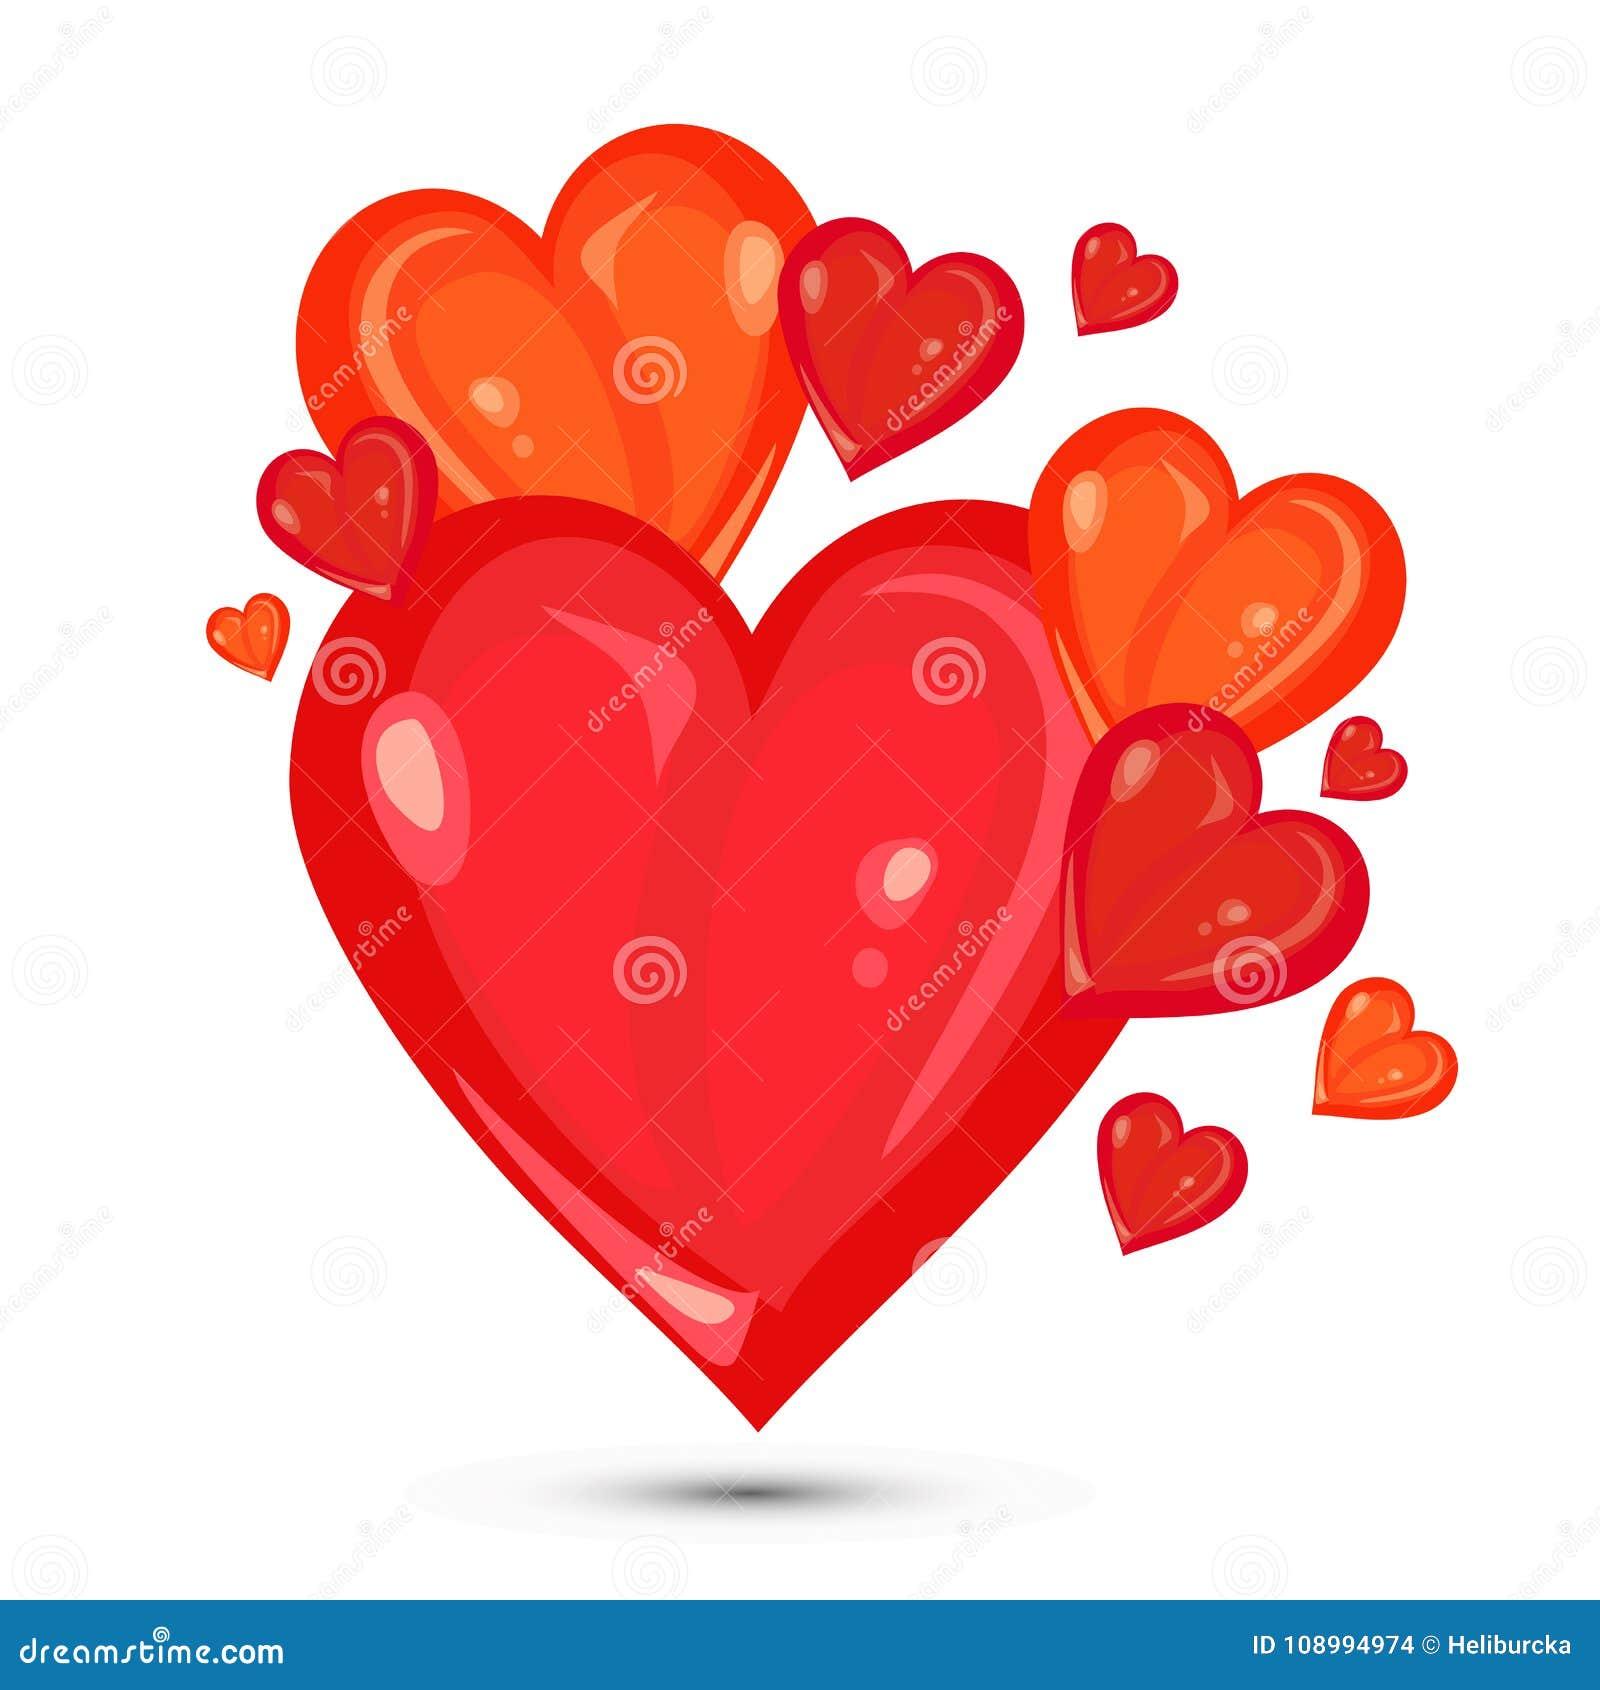 Valentines Hearts Illustration Stock Vector - Illustration of ...